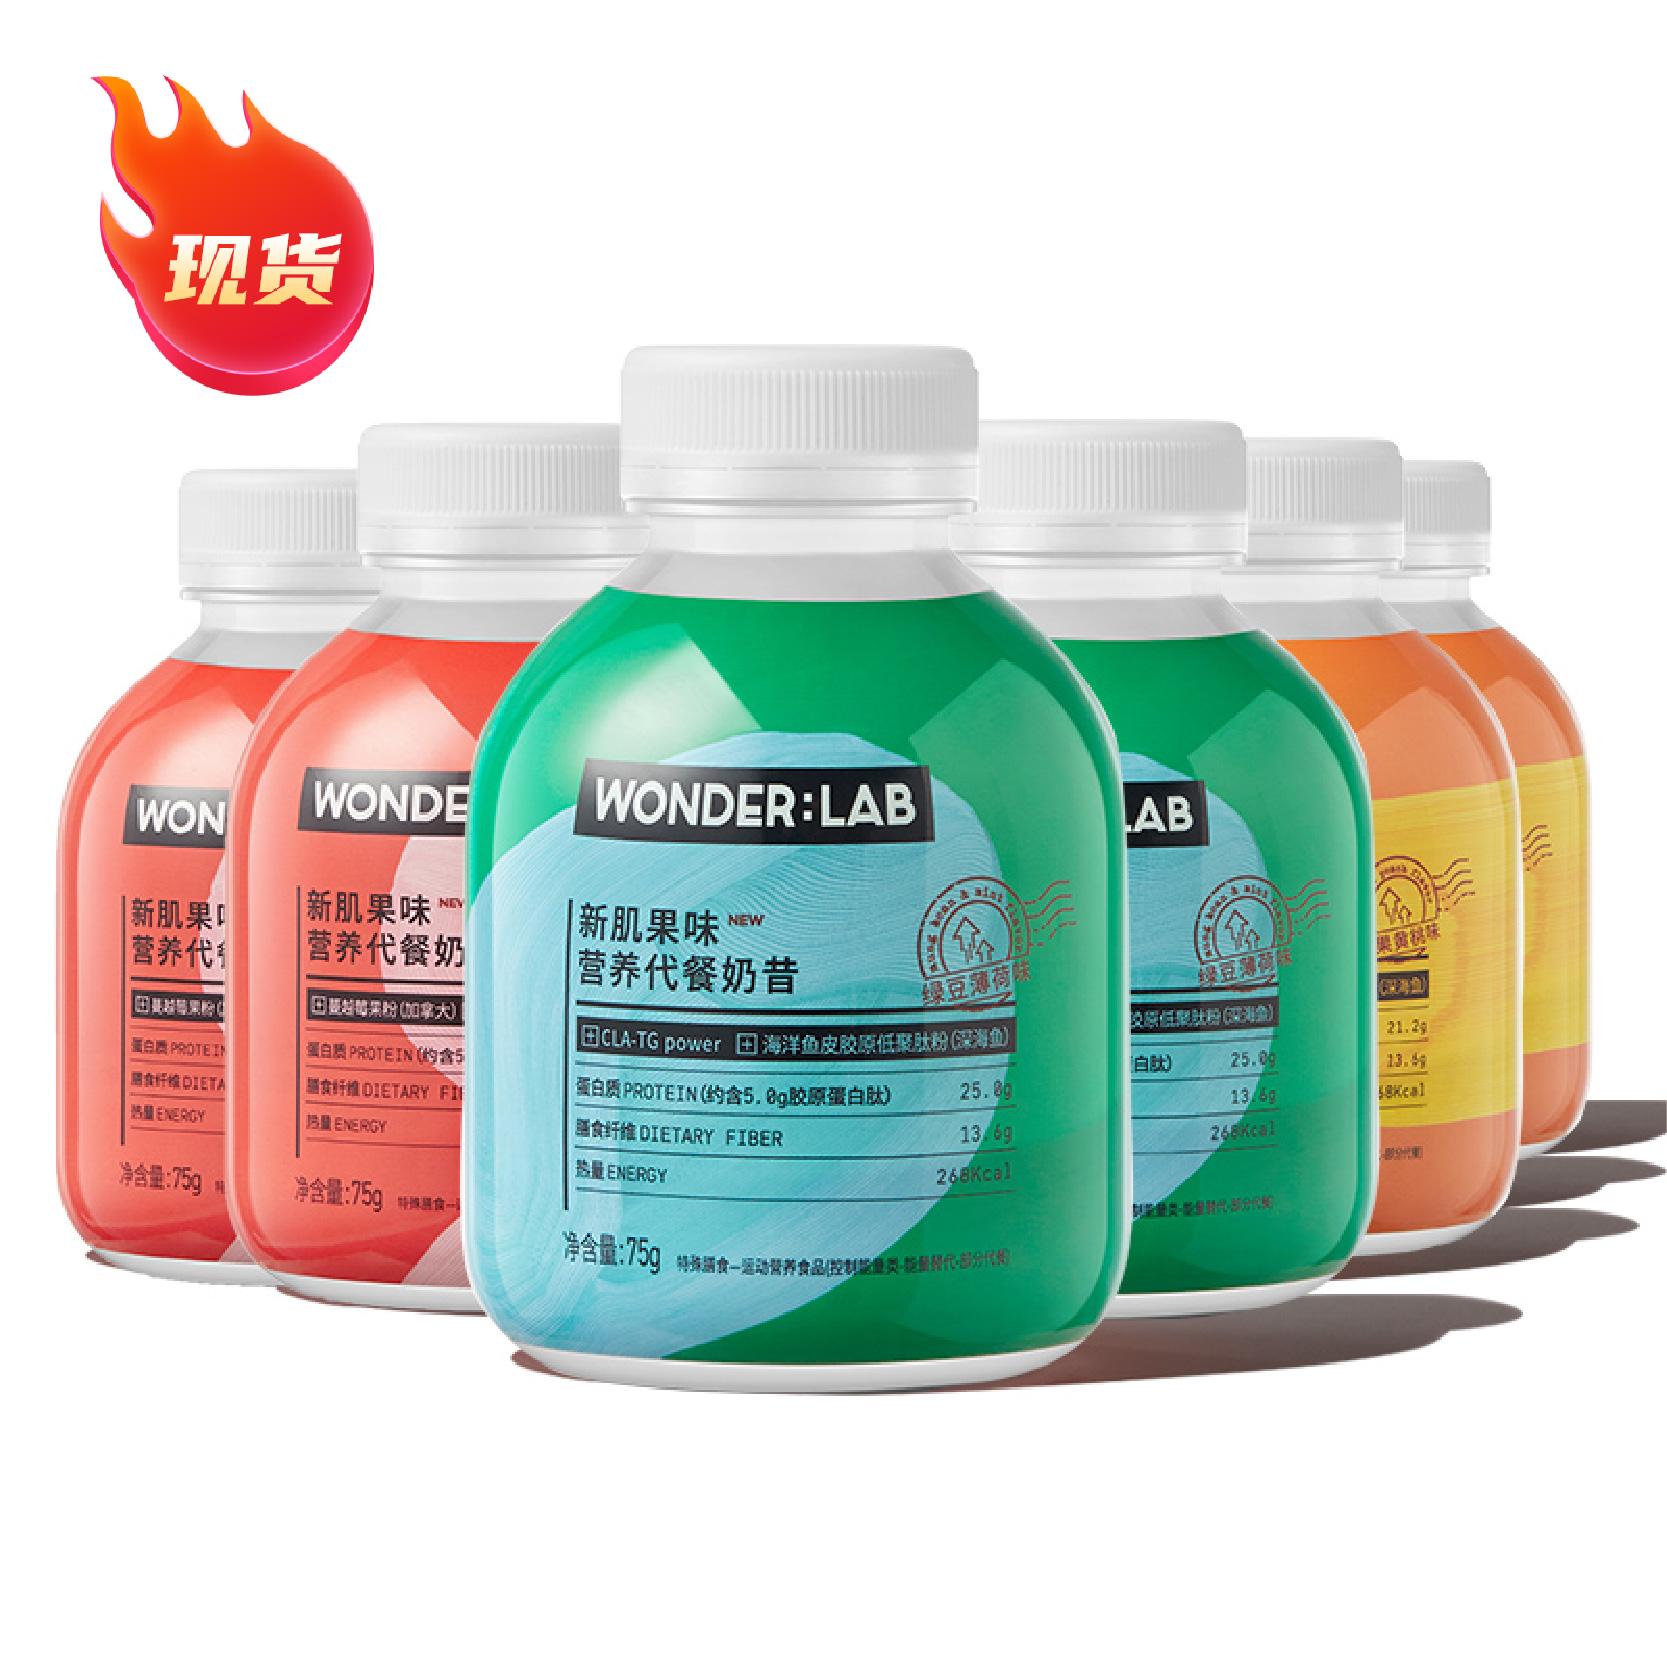 WonderLab 新肌果味代餐奶昔|1瓶1餐|轻盈养肤二合一|6瓶组合装